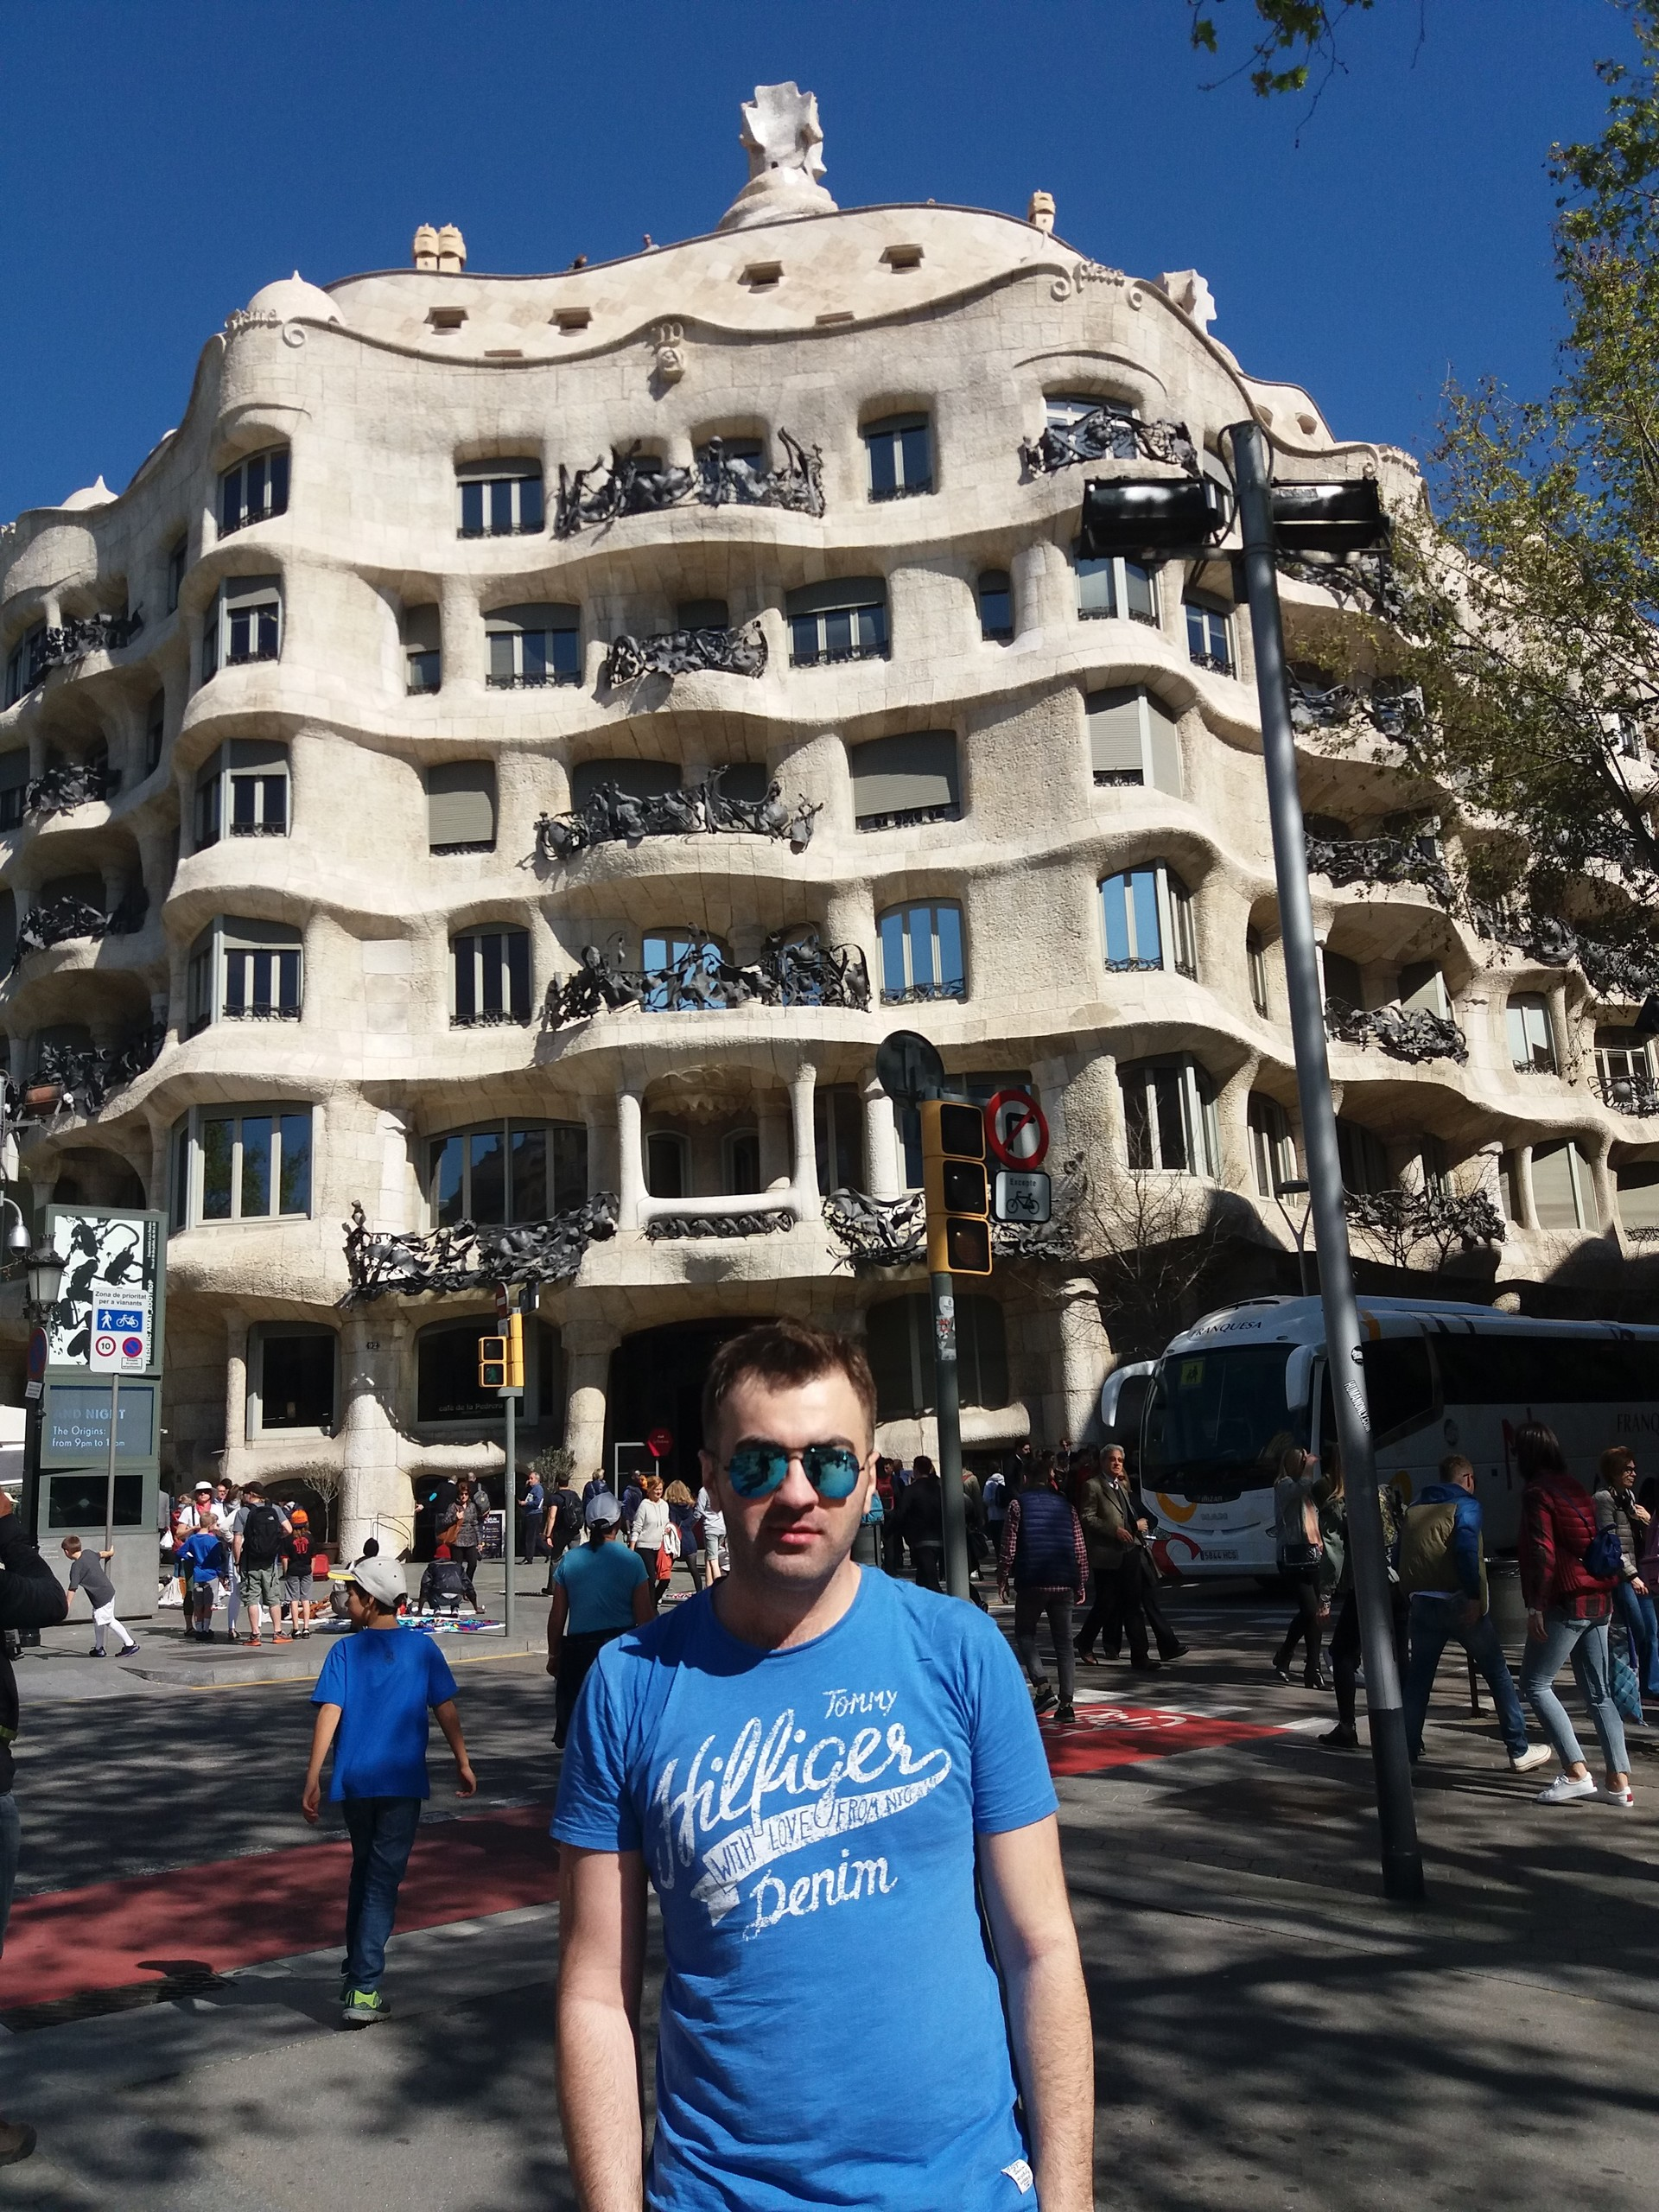 get-lost-barcelona-impressions-7d96ac45a